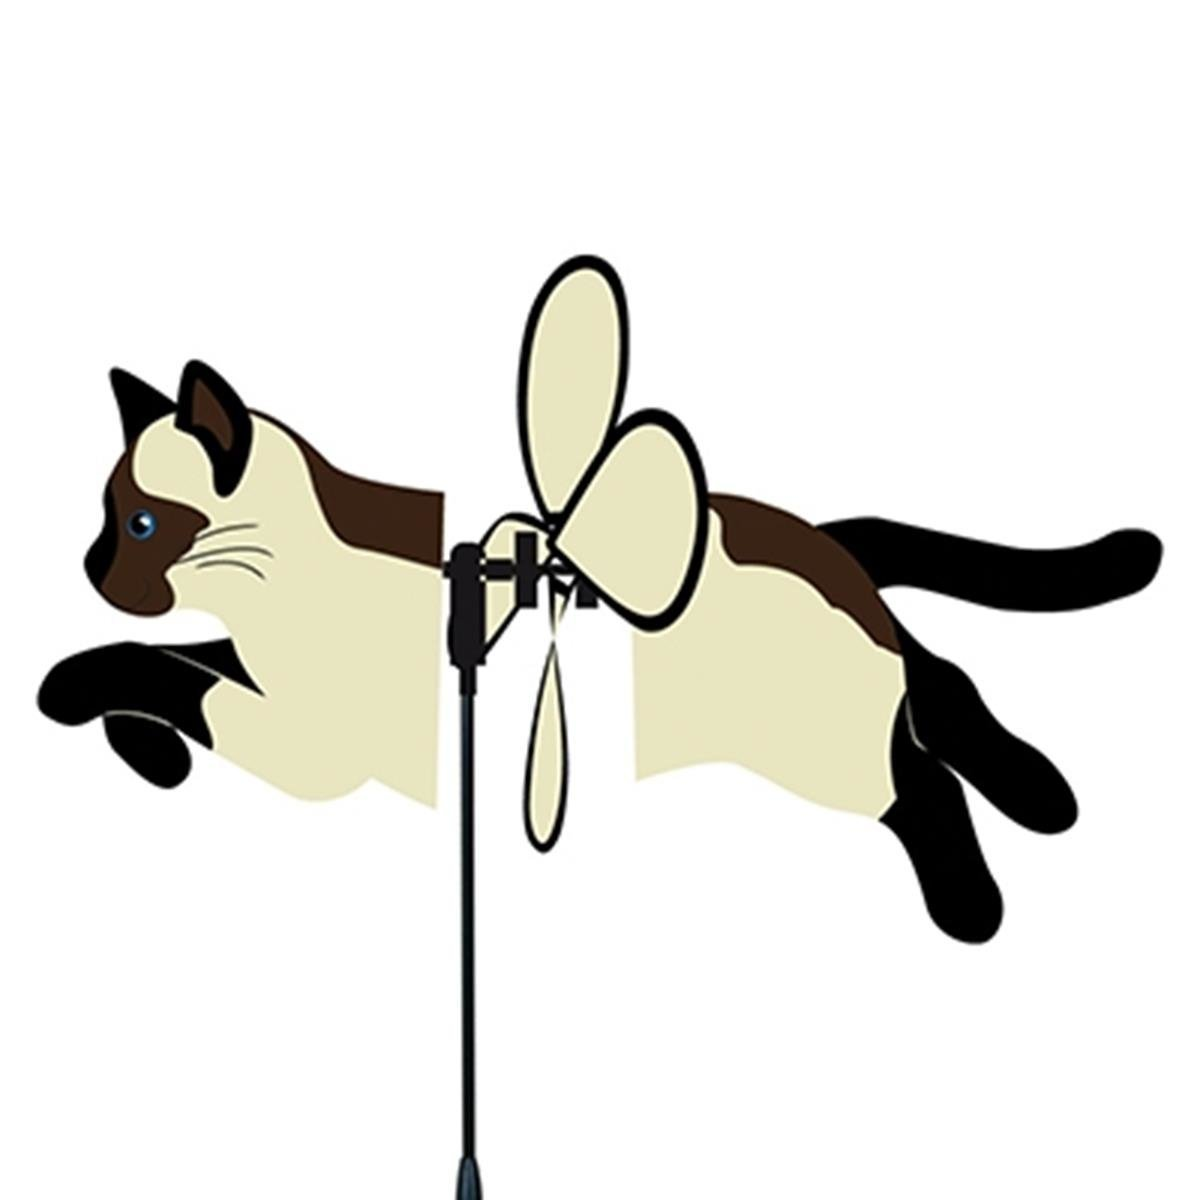 Wind Garden Petite Flying Spinner - Siamese Cat PREMIER KITES & DESIGNS 25061